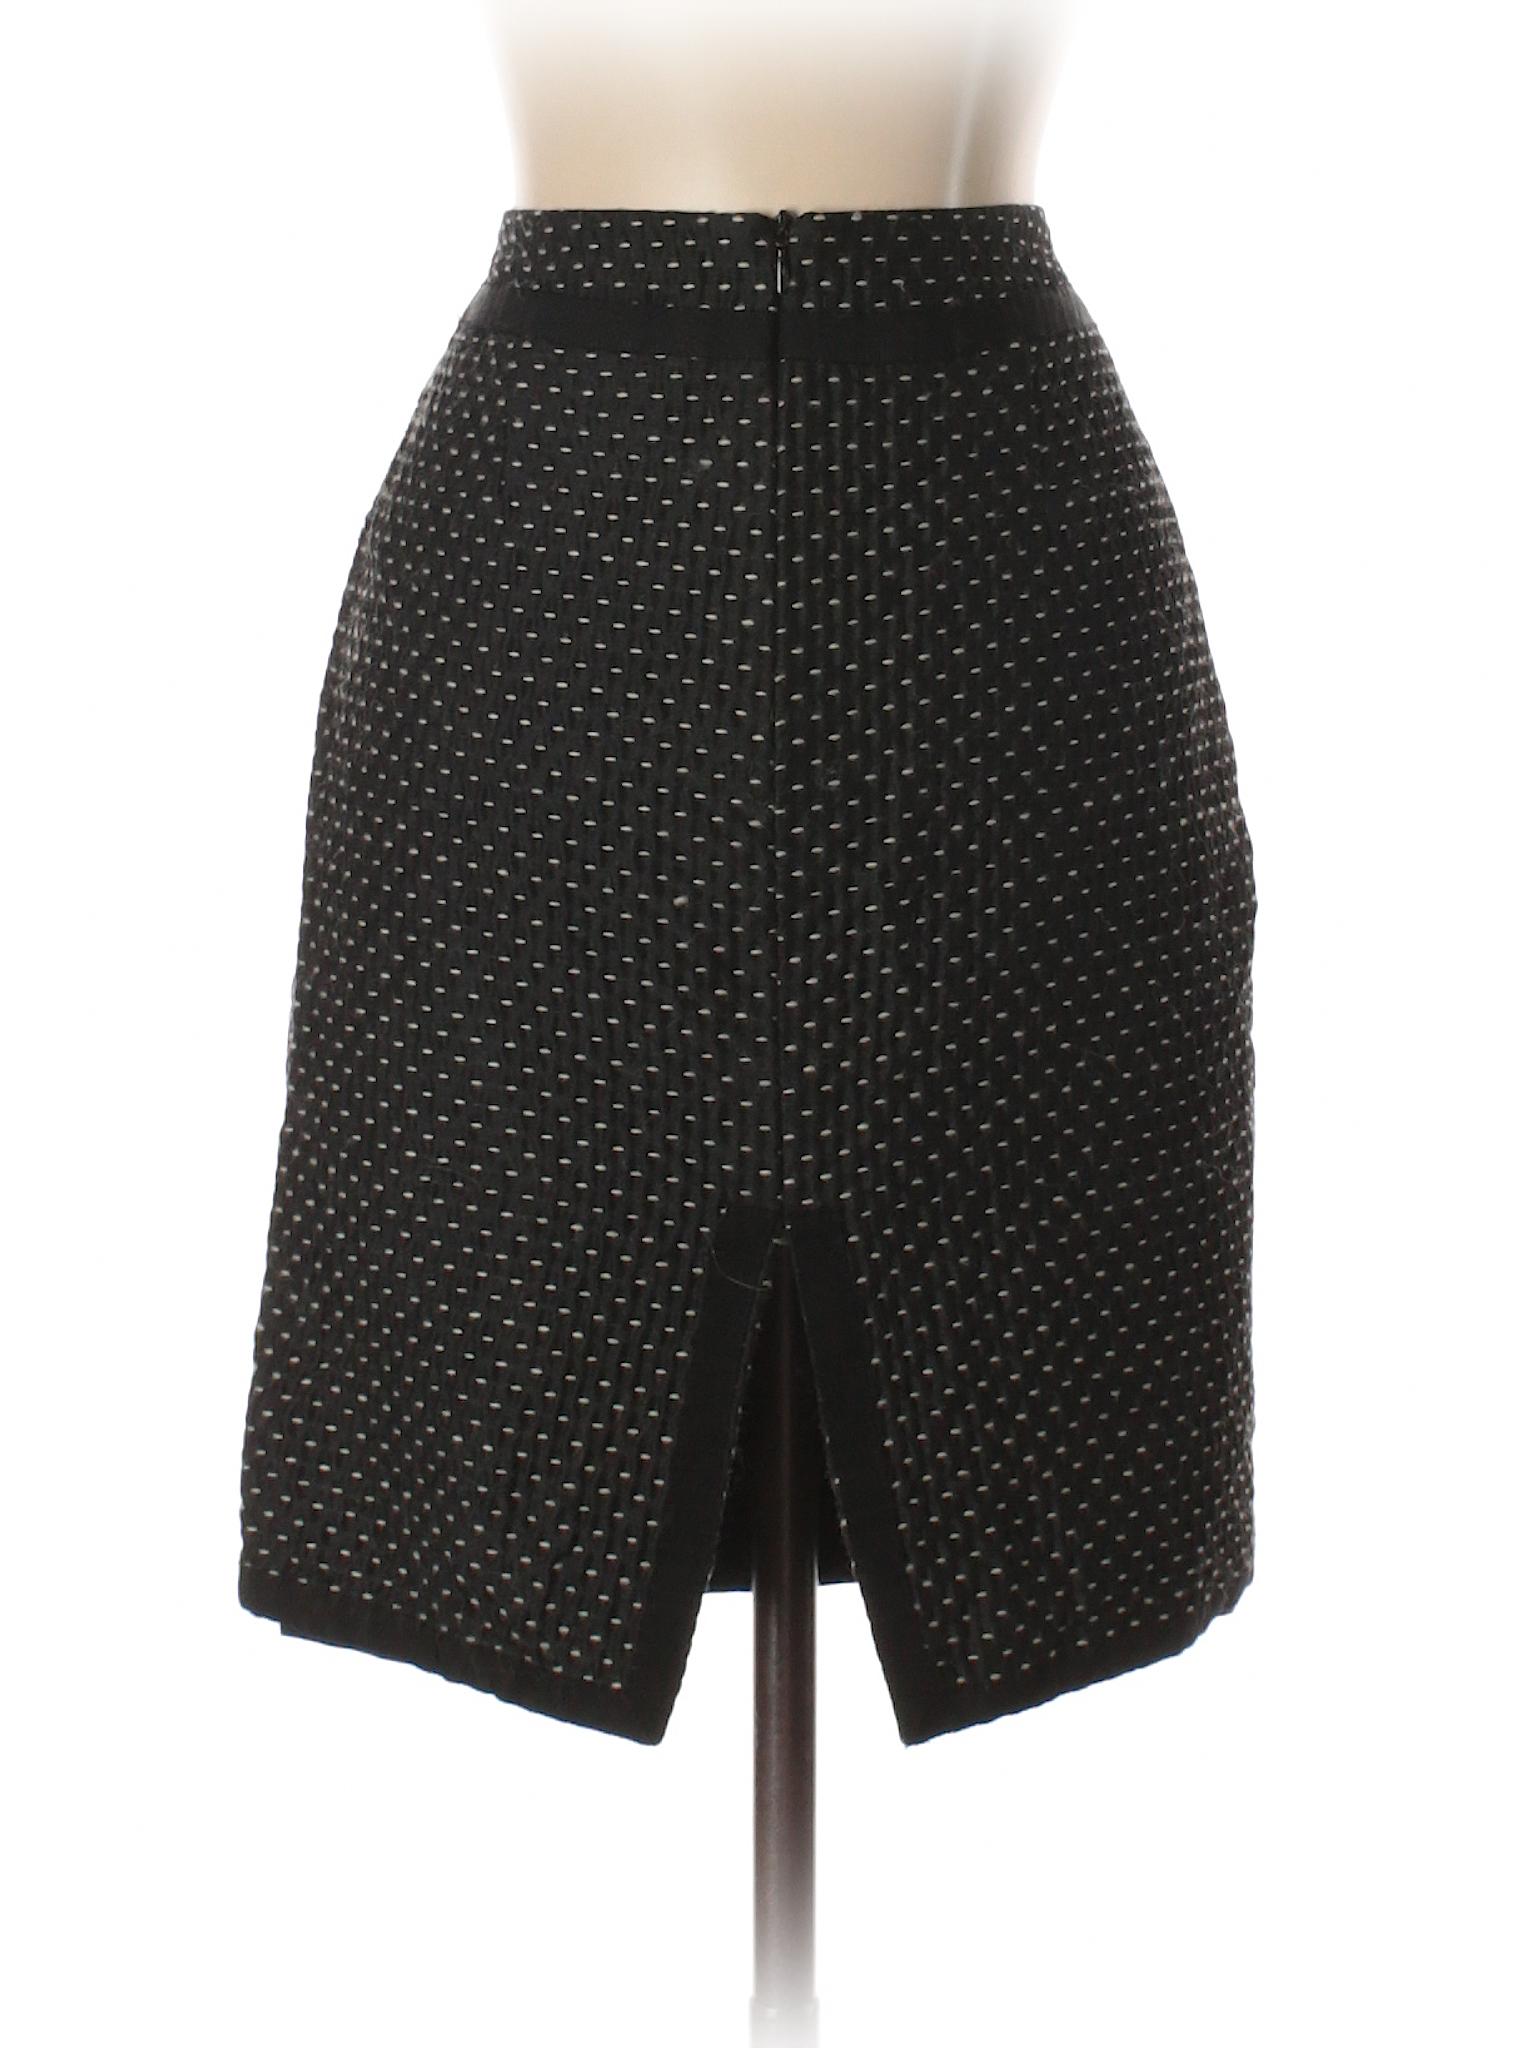 Lepore Leisure winter Wool Skirt Nanette qpEEwgB7